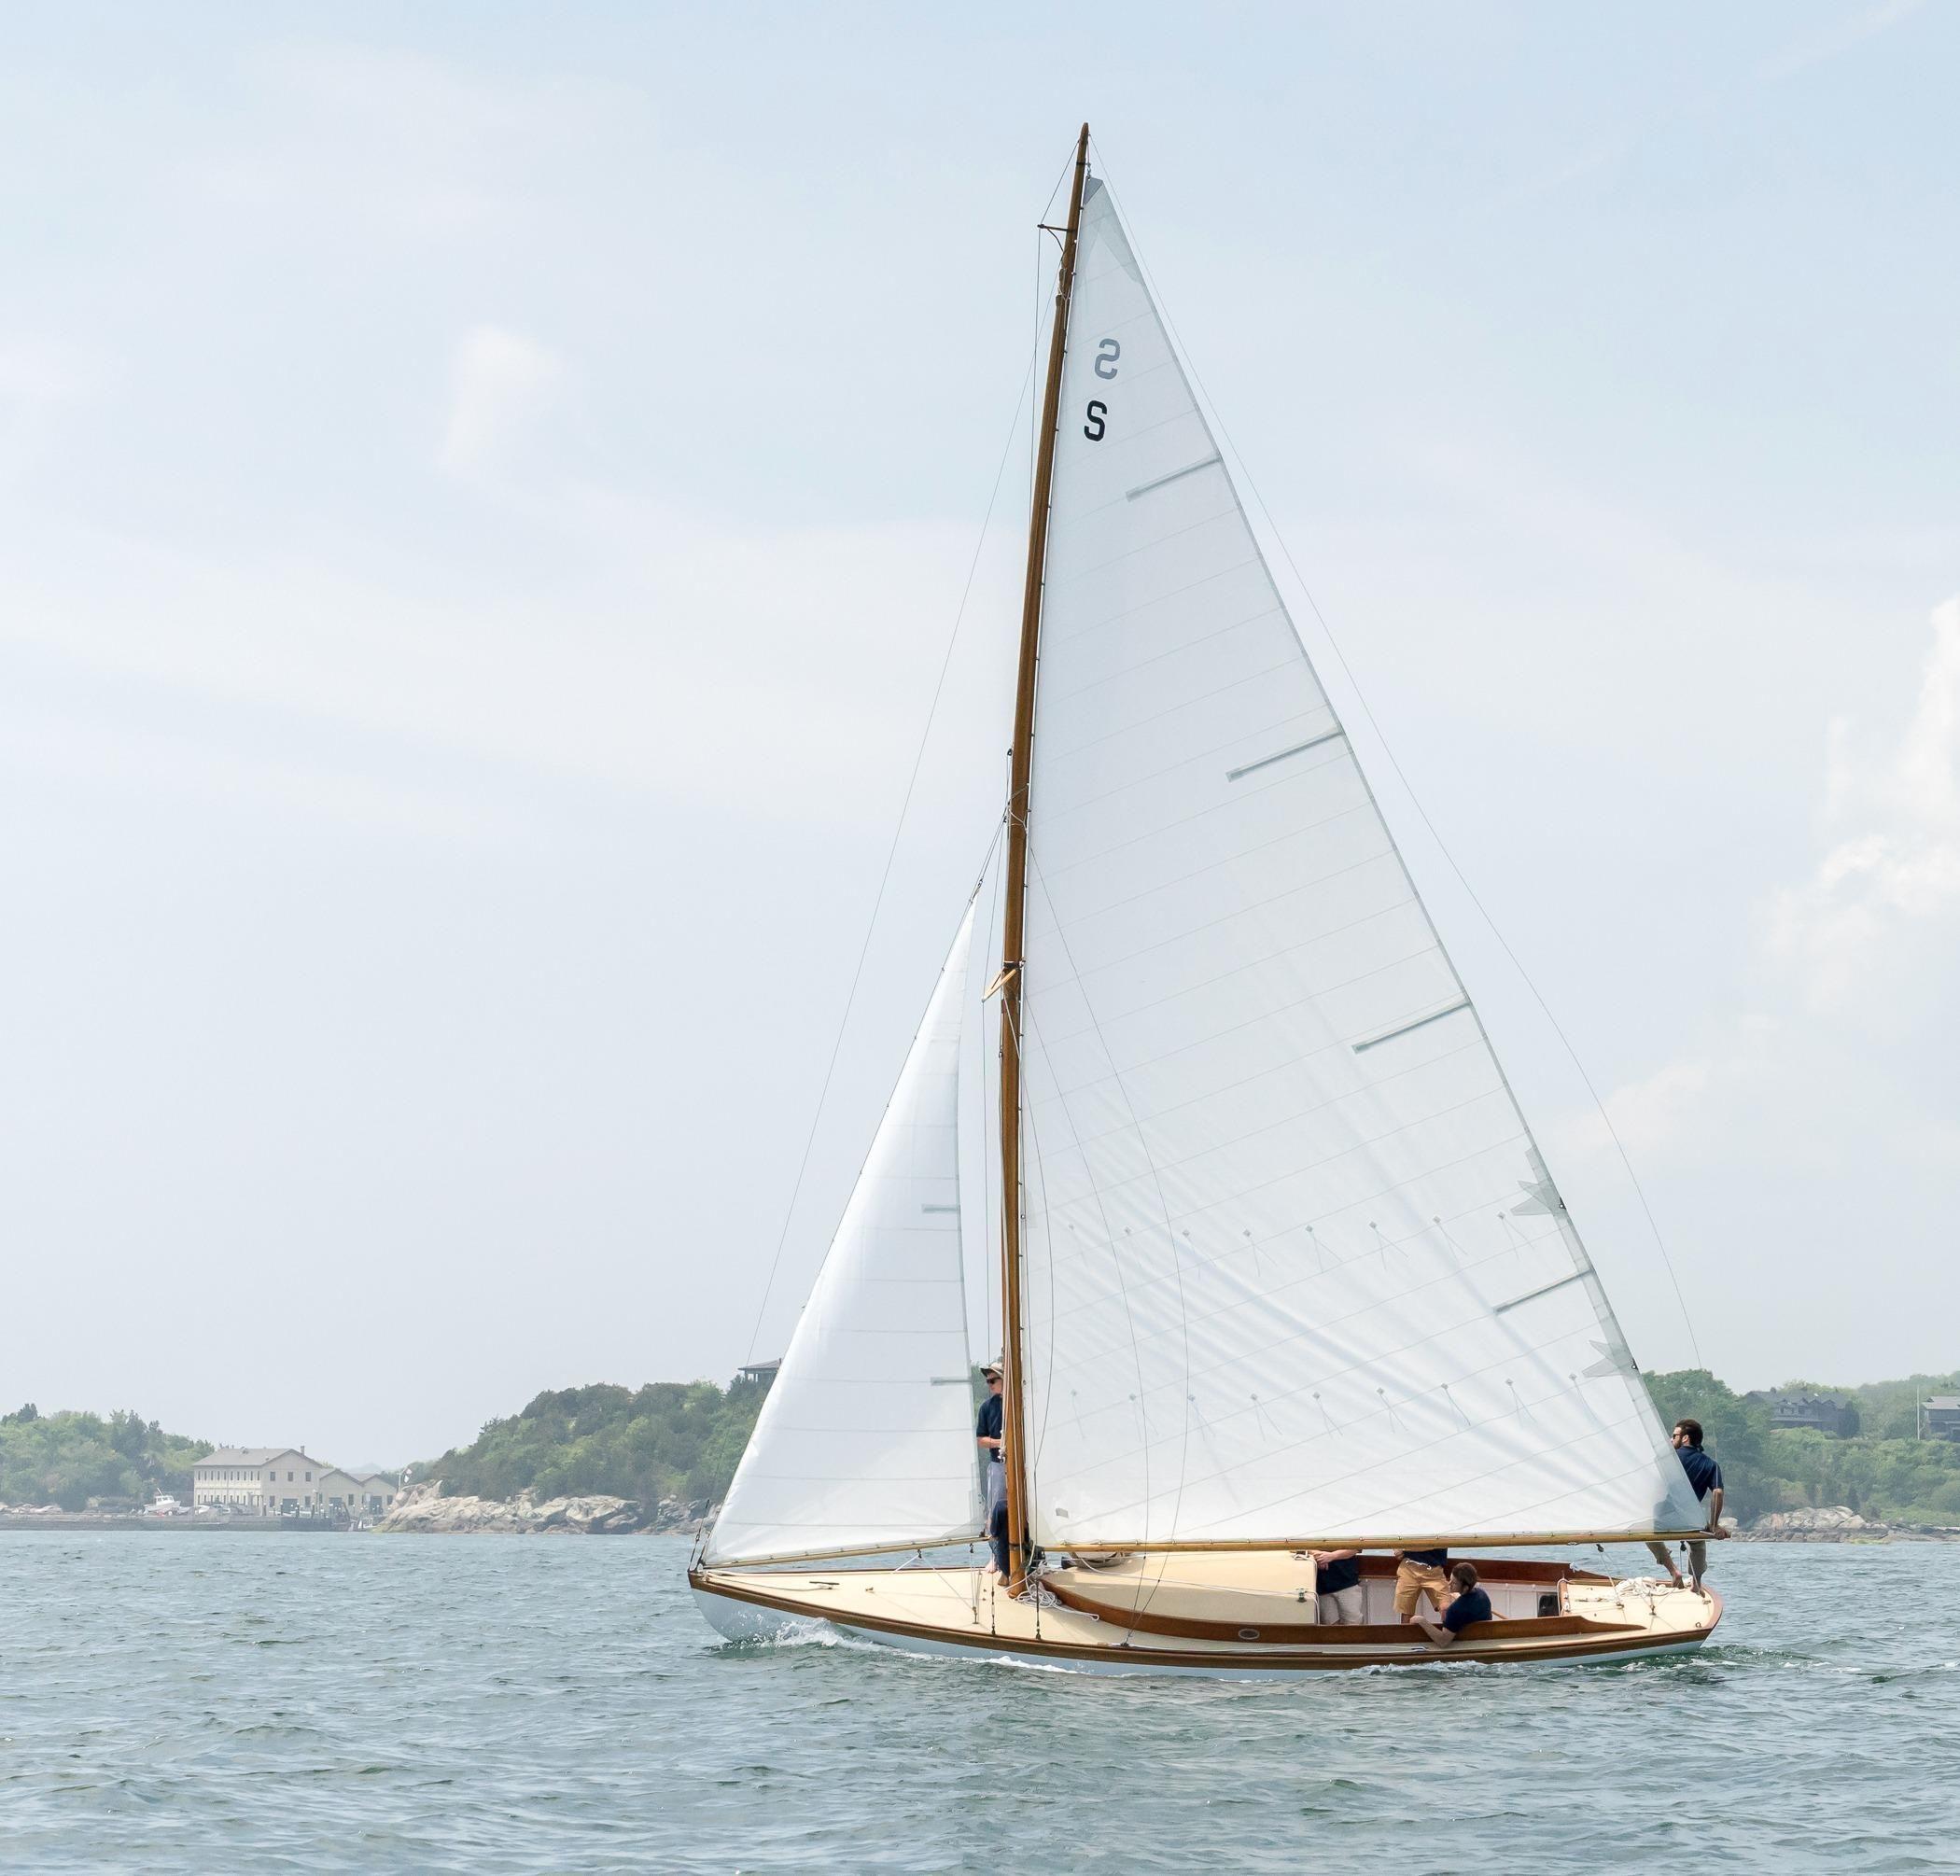 1925 Herreshoff S-Class Sail Boat For Sale - www.yachtworld.com